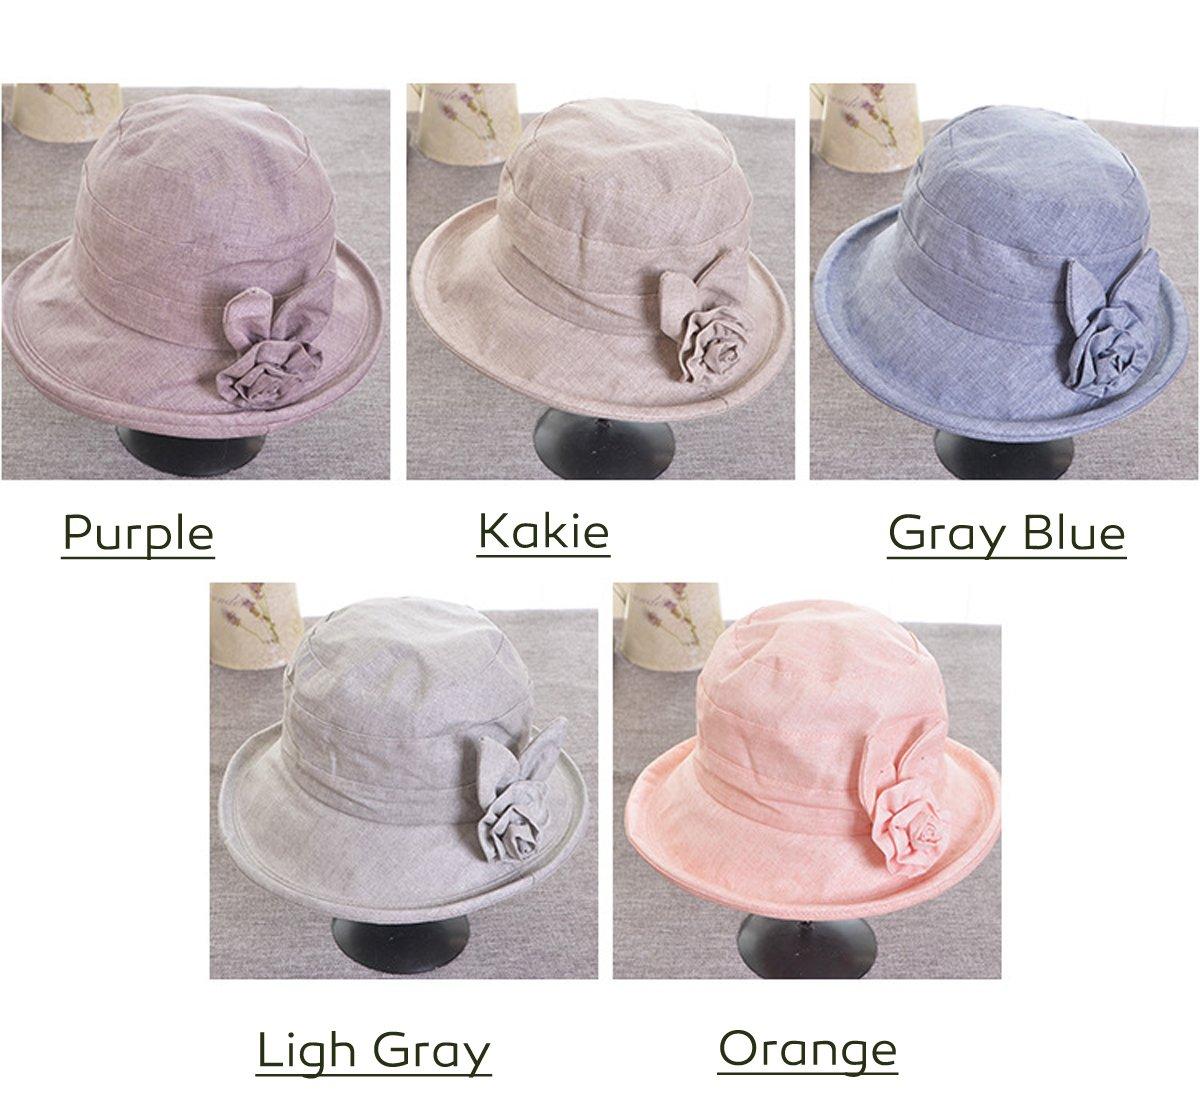 HAPEE Womens Garden Sun Hat,UPF 50+ Summer Hats for Ladies,Butterfly GrayBlue